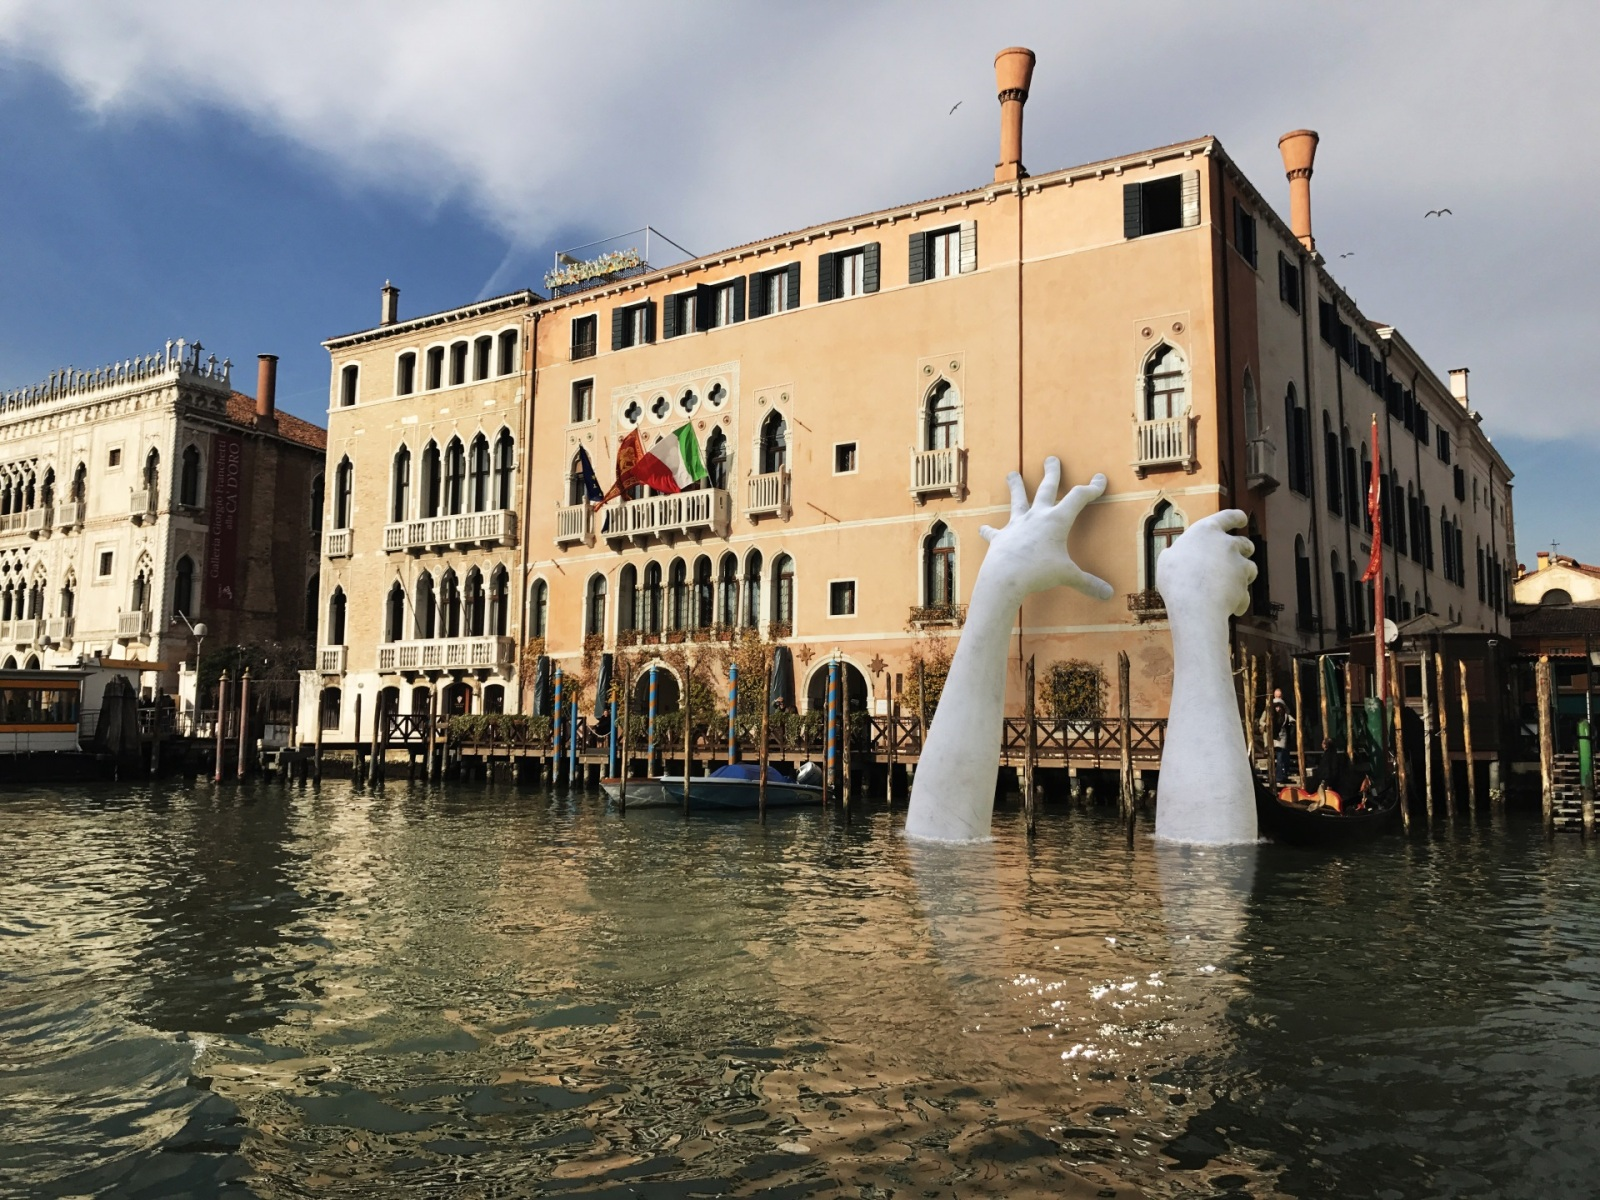 Lorenzo_Quinn_Venice_Biennale_Halcyon_Gallery_b